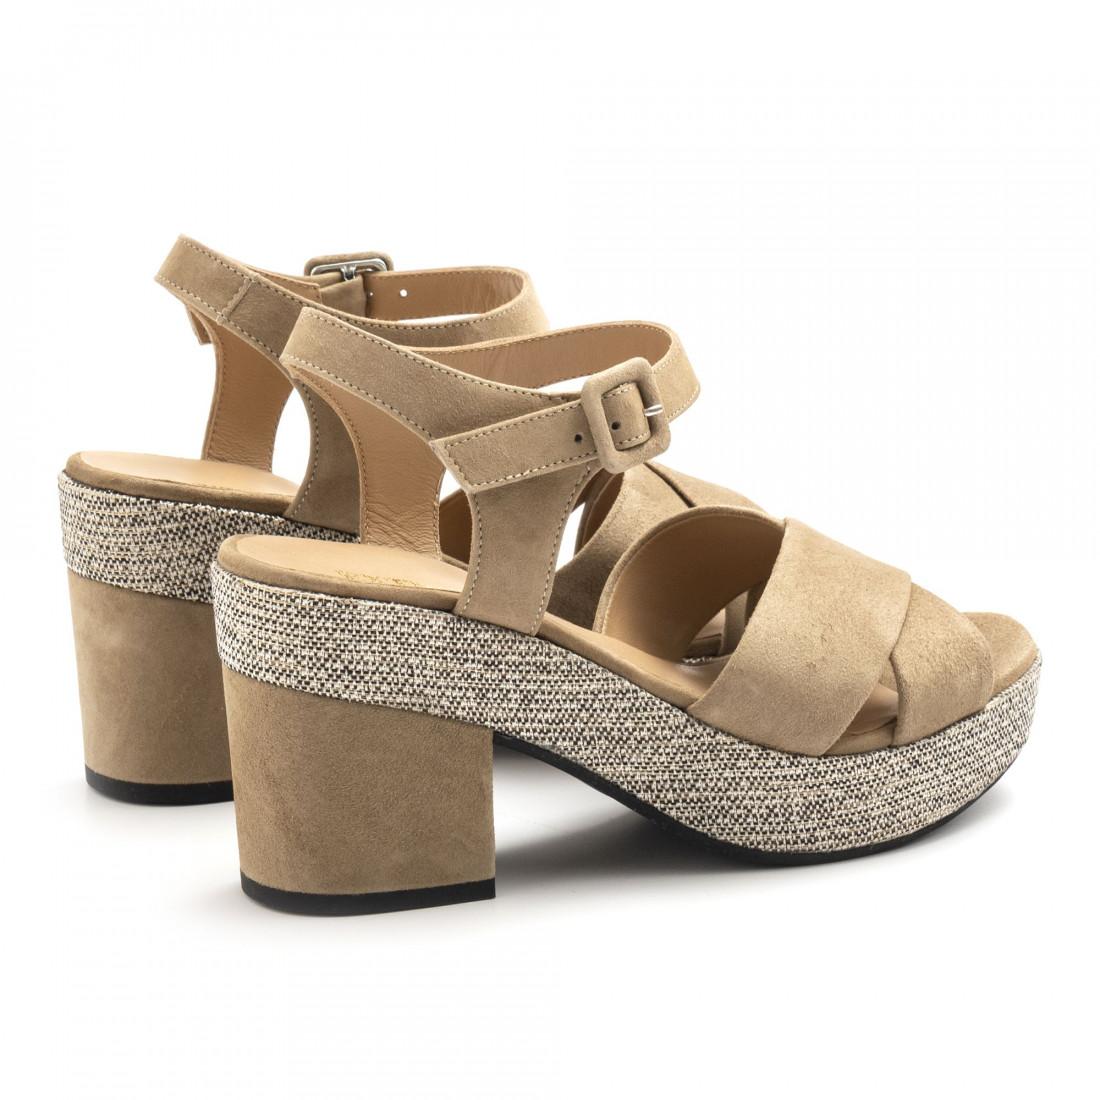 sandals woman extreme 2666camoscio ecru 4935